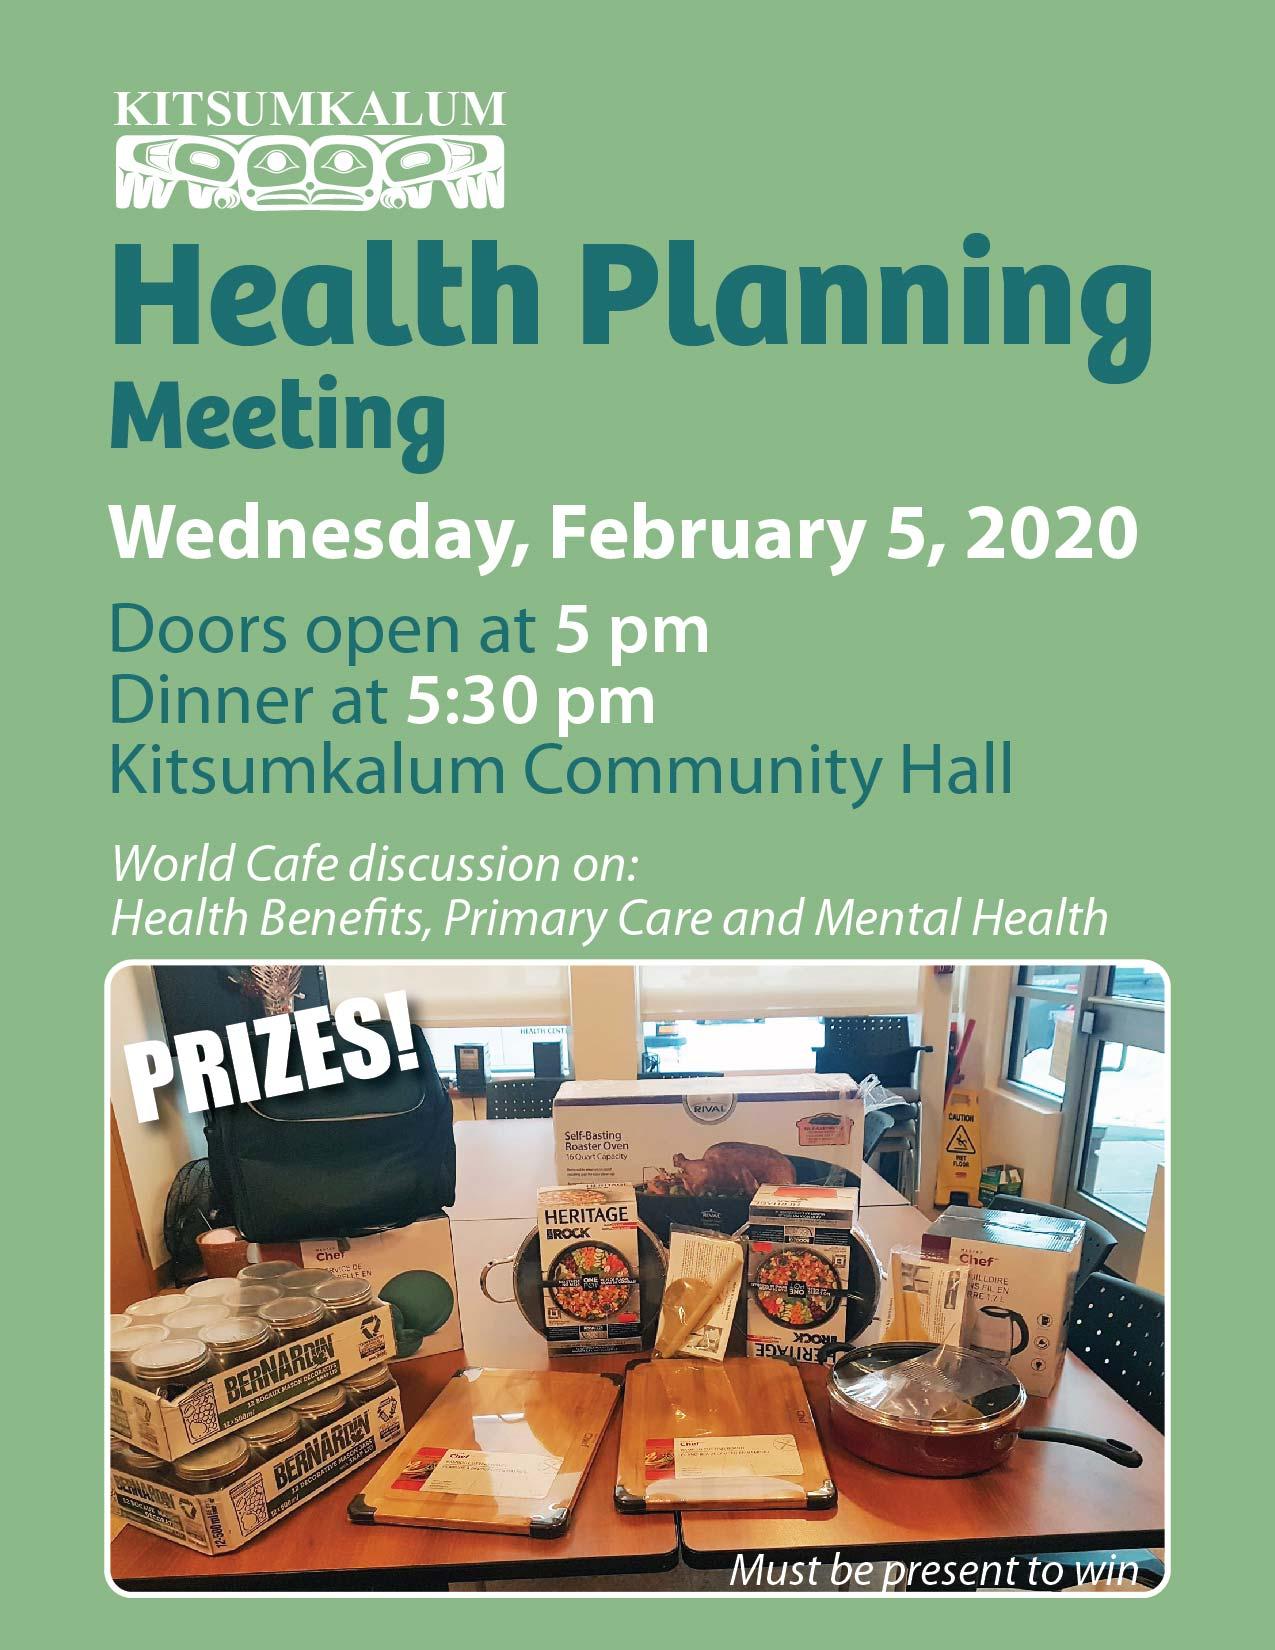 Kitsumkalum Health Planning Meeting FEB 5